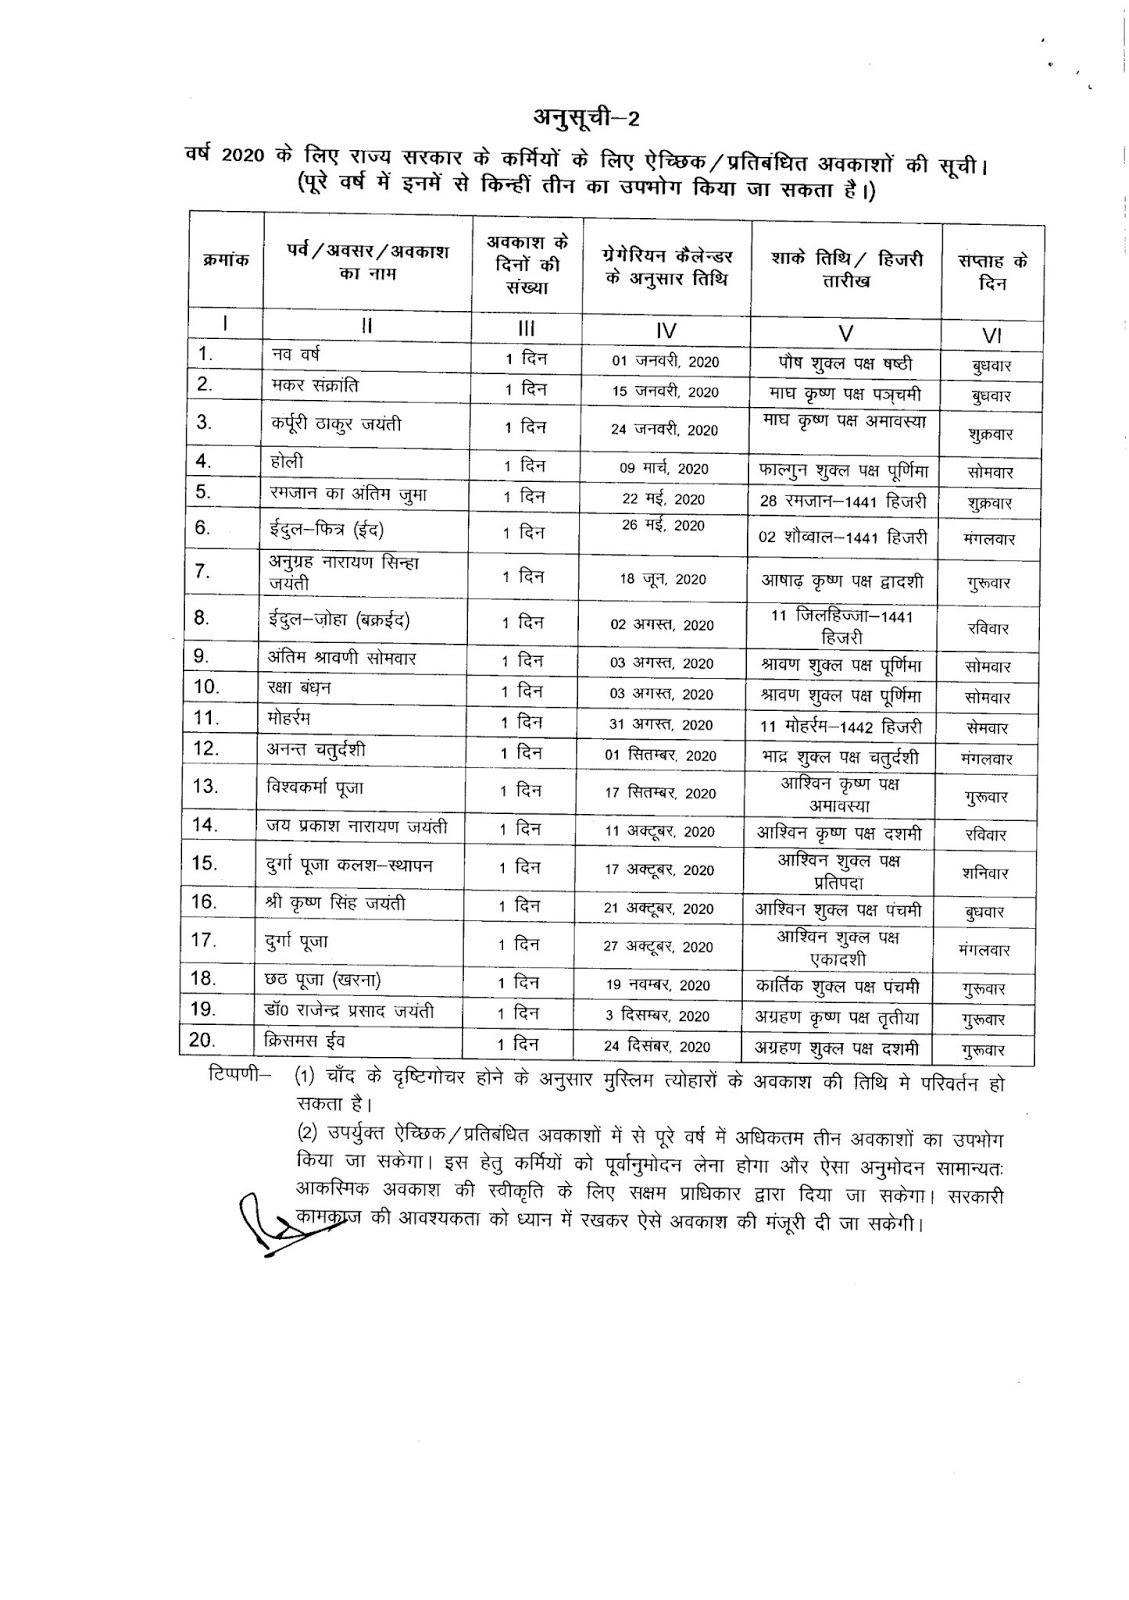 Bihar Government Calendar 2020 #educratsweb with regard to Bihar Govt. Calendar